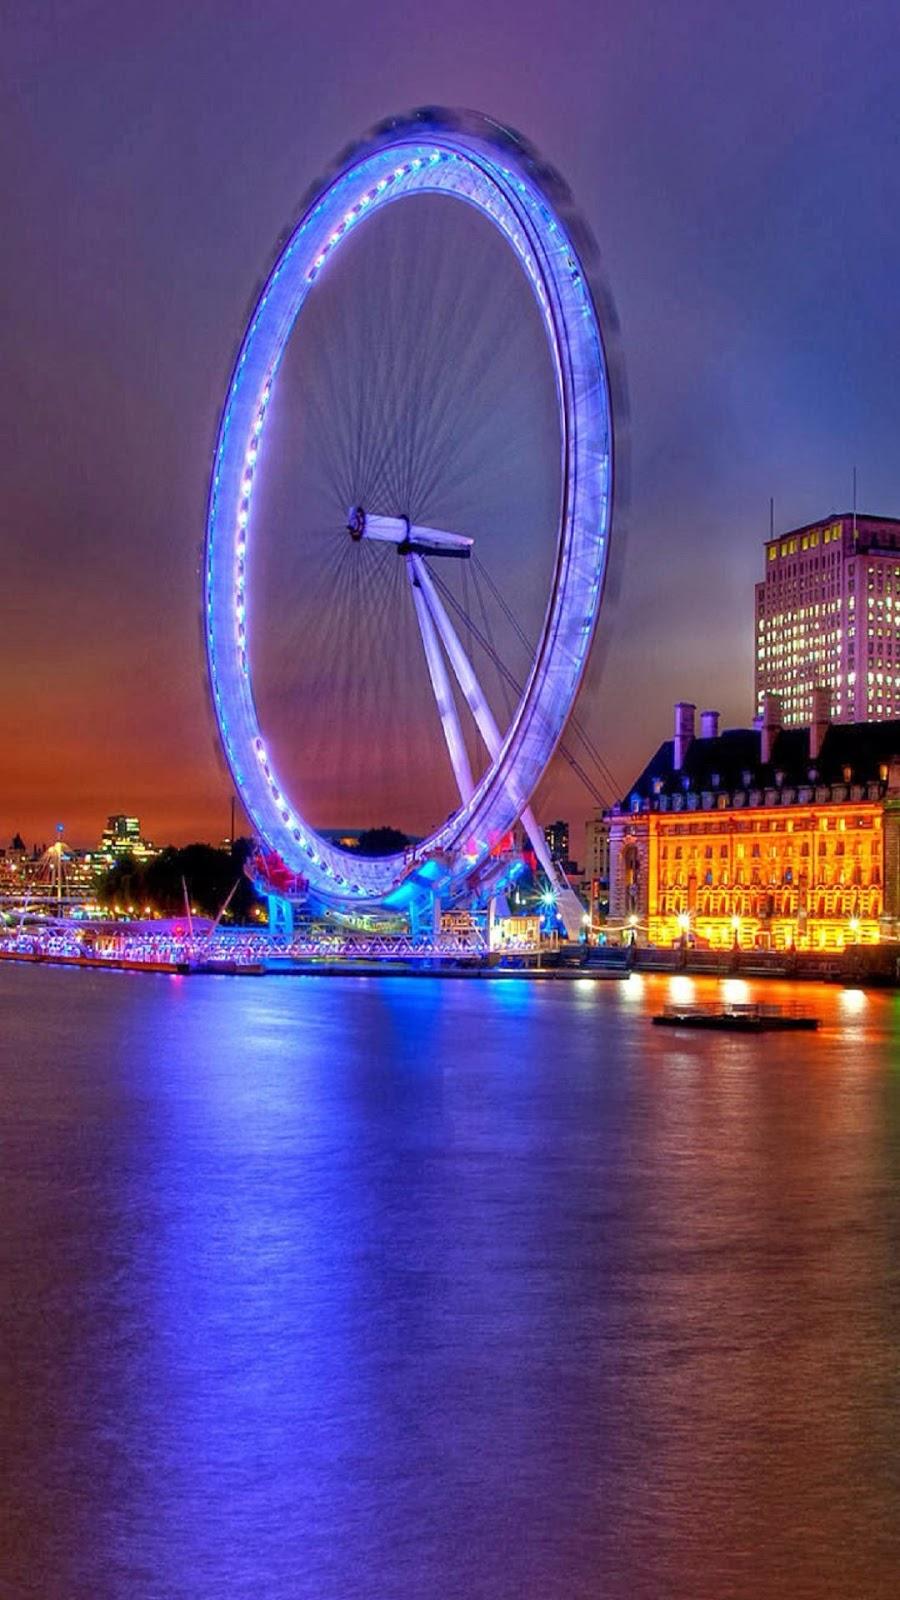 Wallpaper Android Kincir Bercahaya Biru London